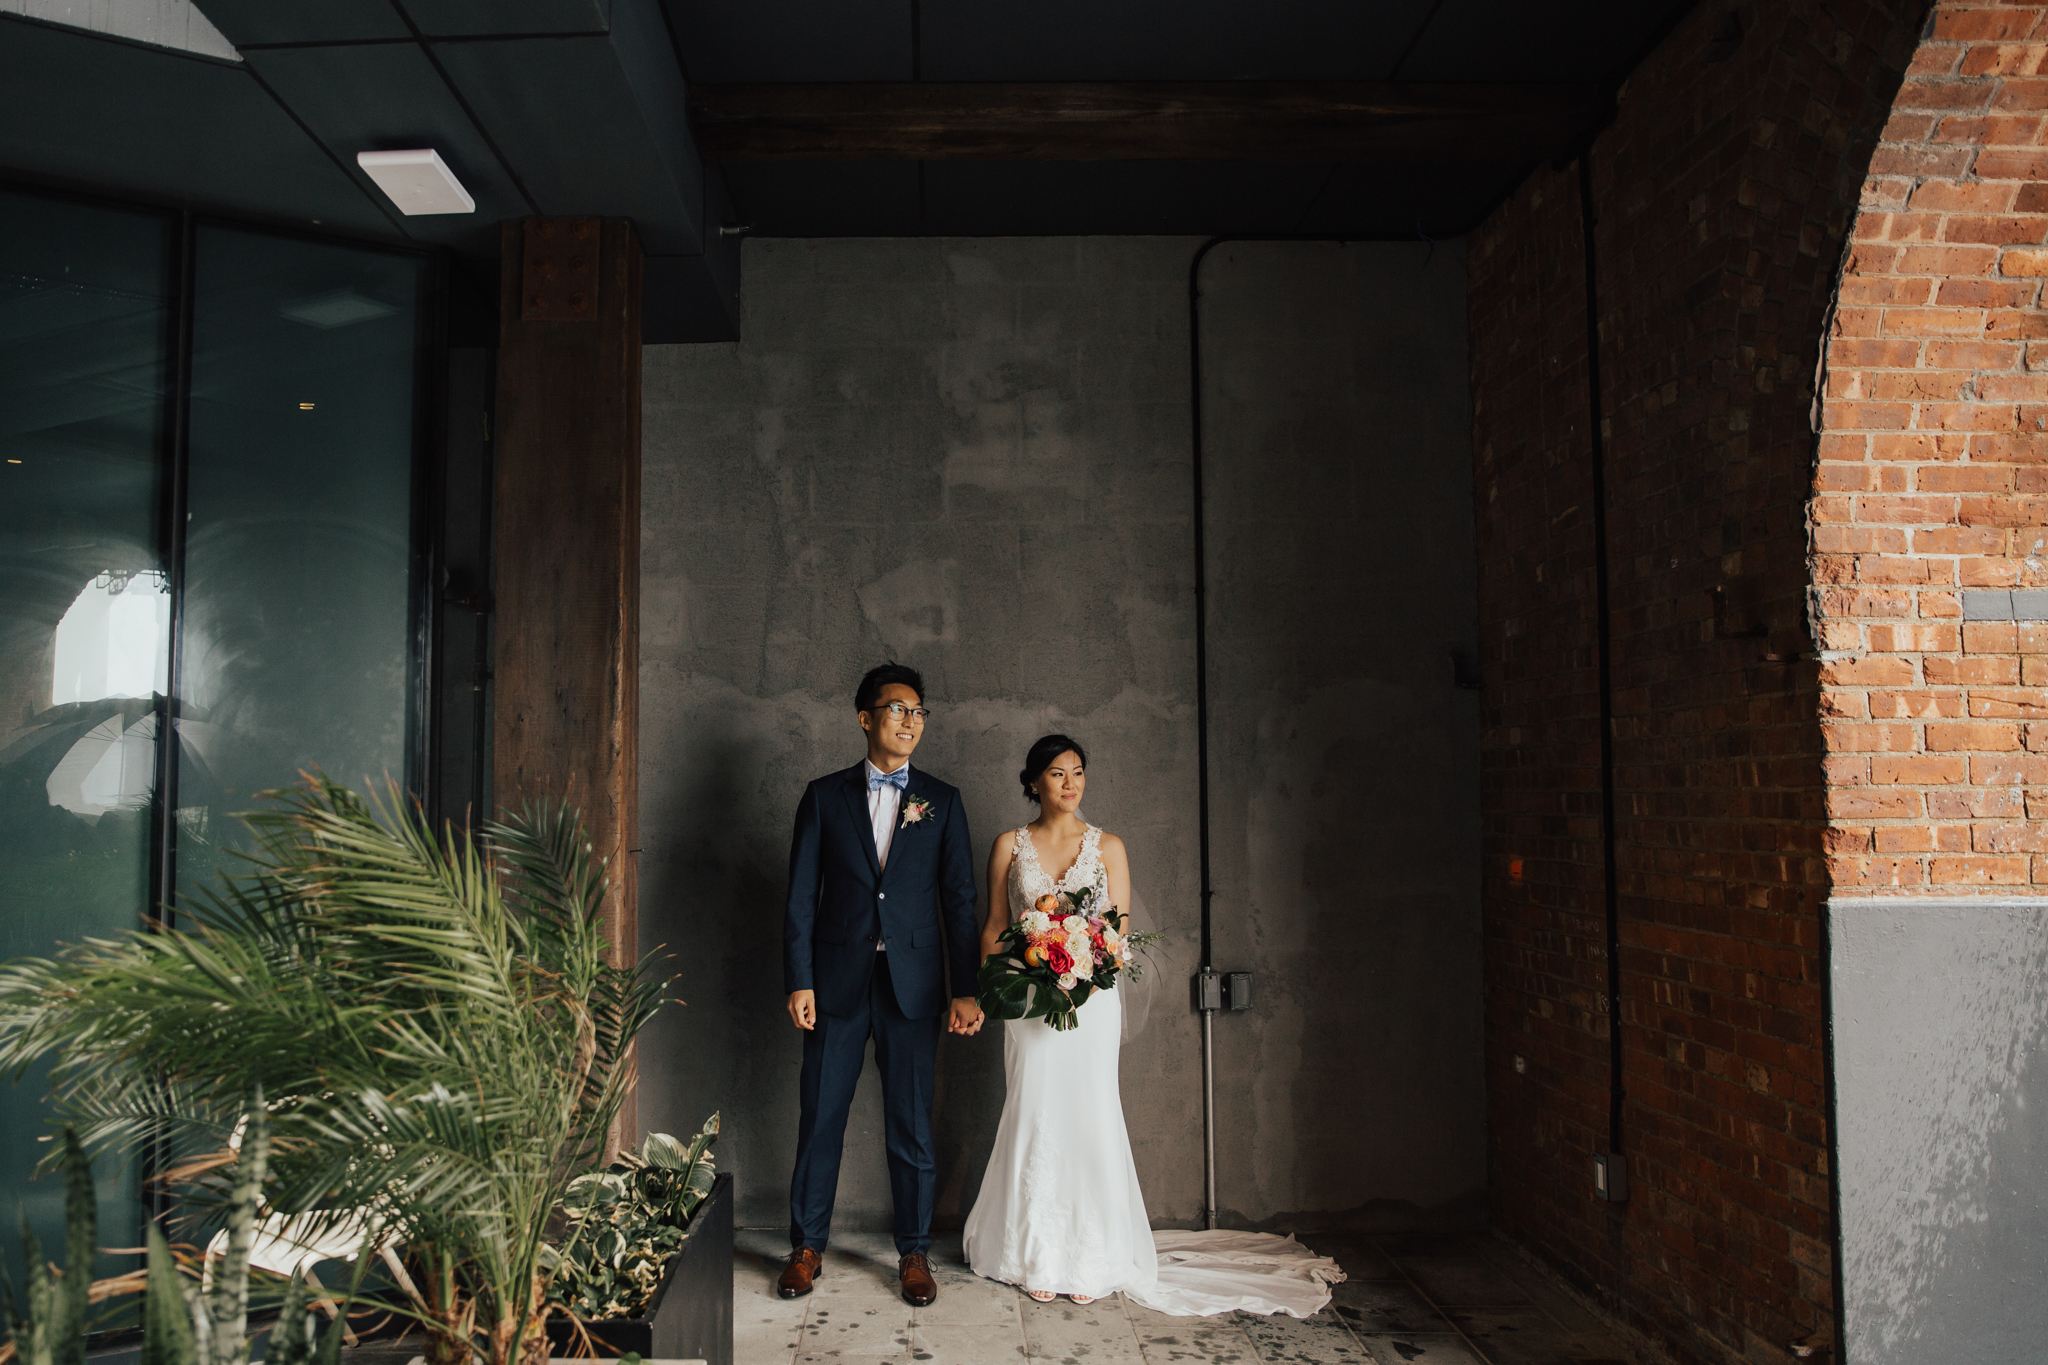 New York Romantic wedding photos